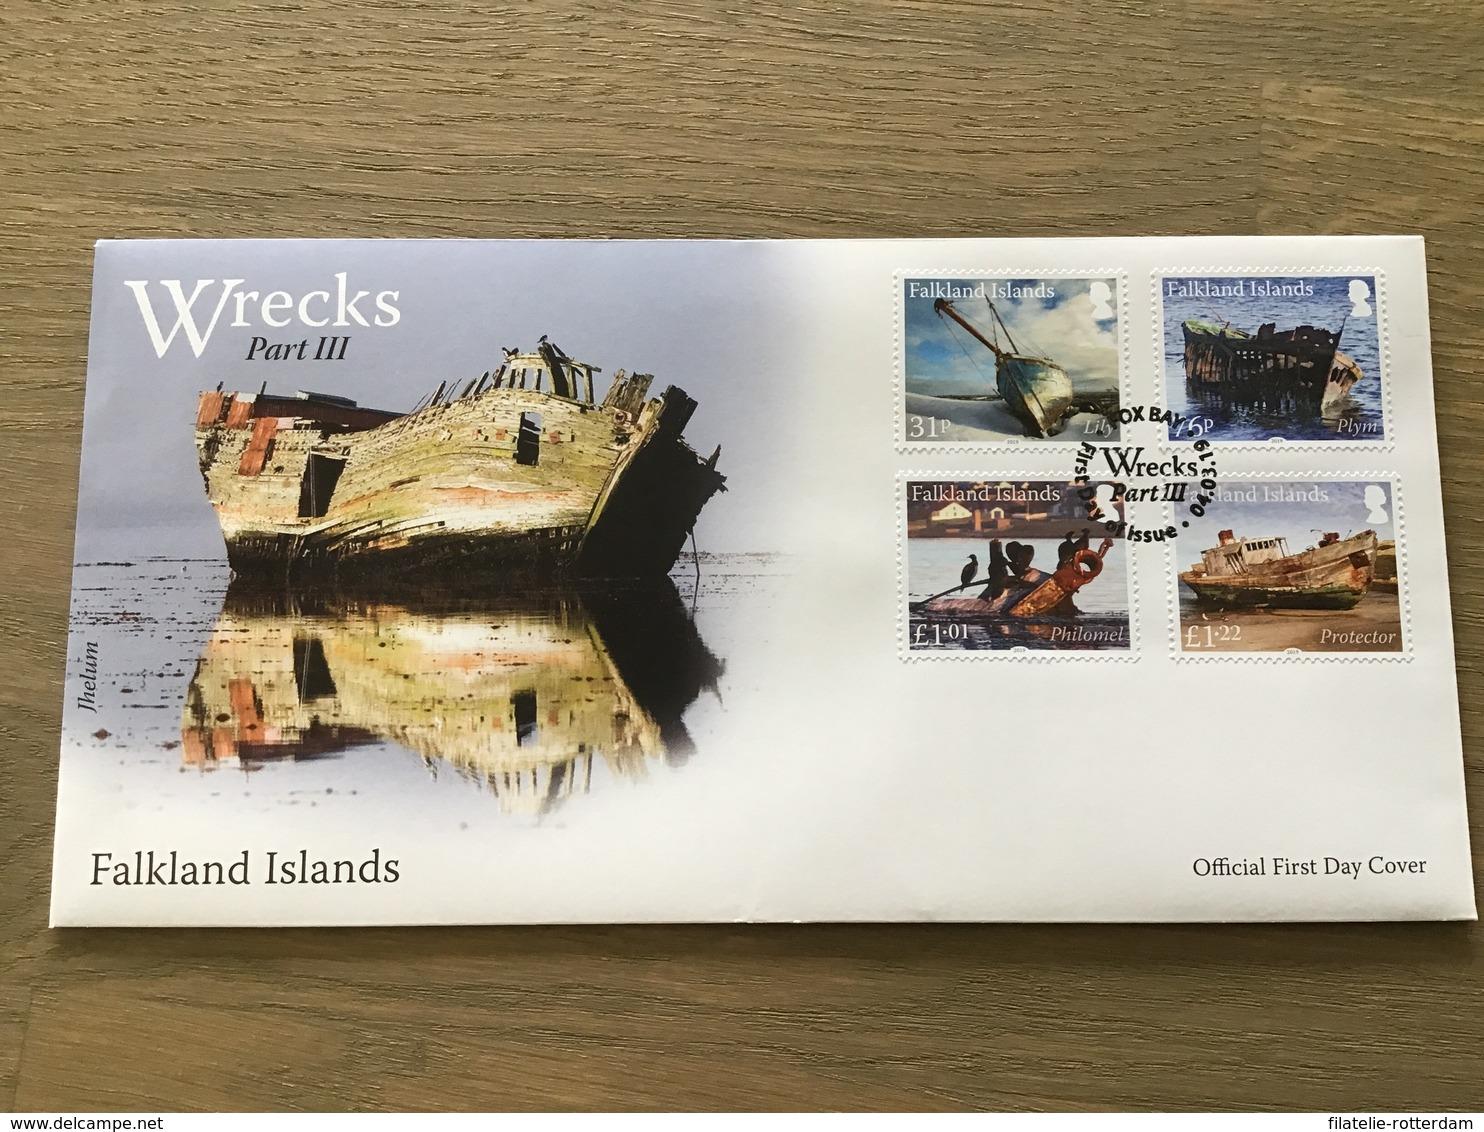 Falklandeilanden / Falkland Islands - Postfris / MNH - FDC Scheepswrakken 2019 - Falklandeilanden